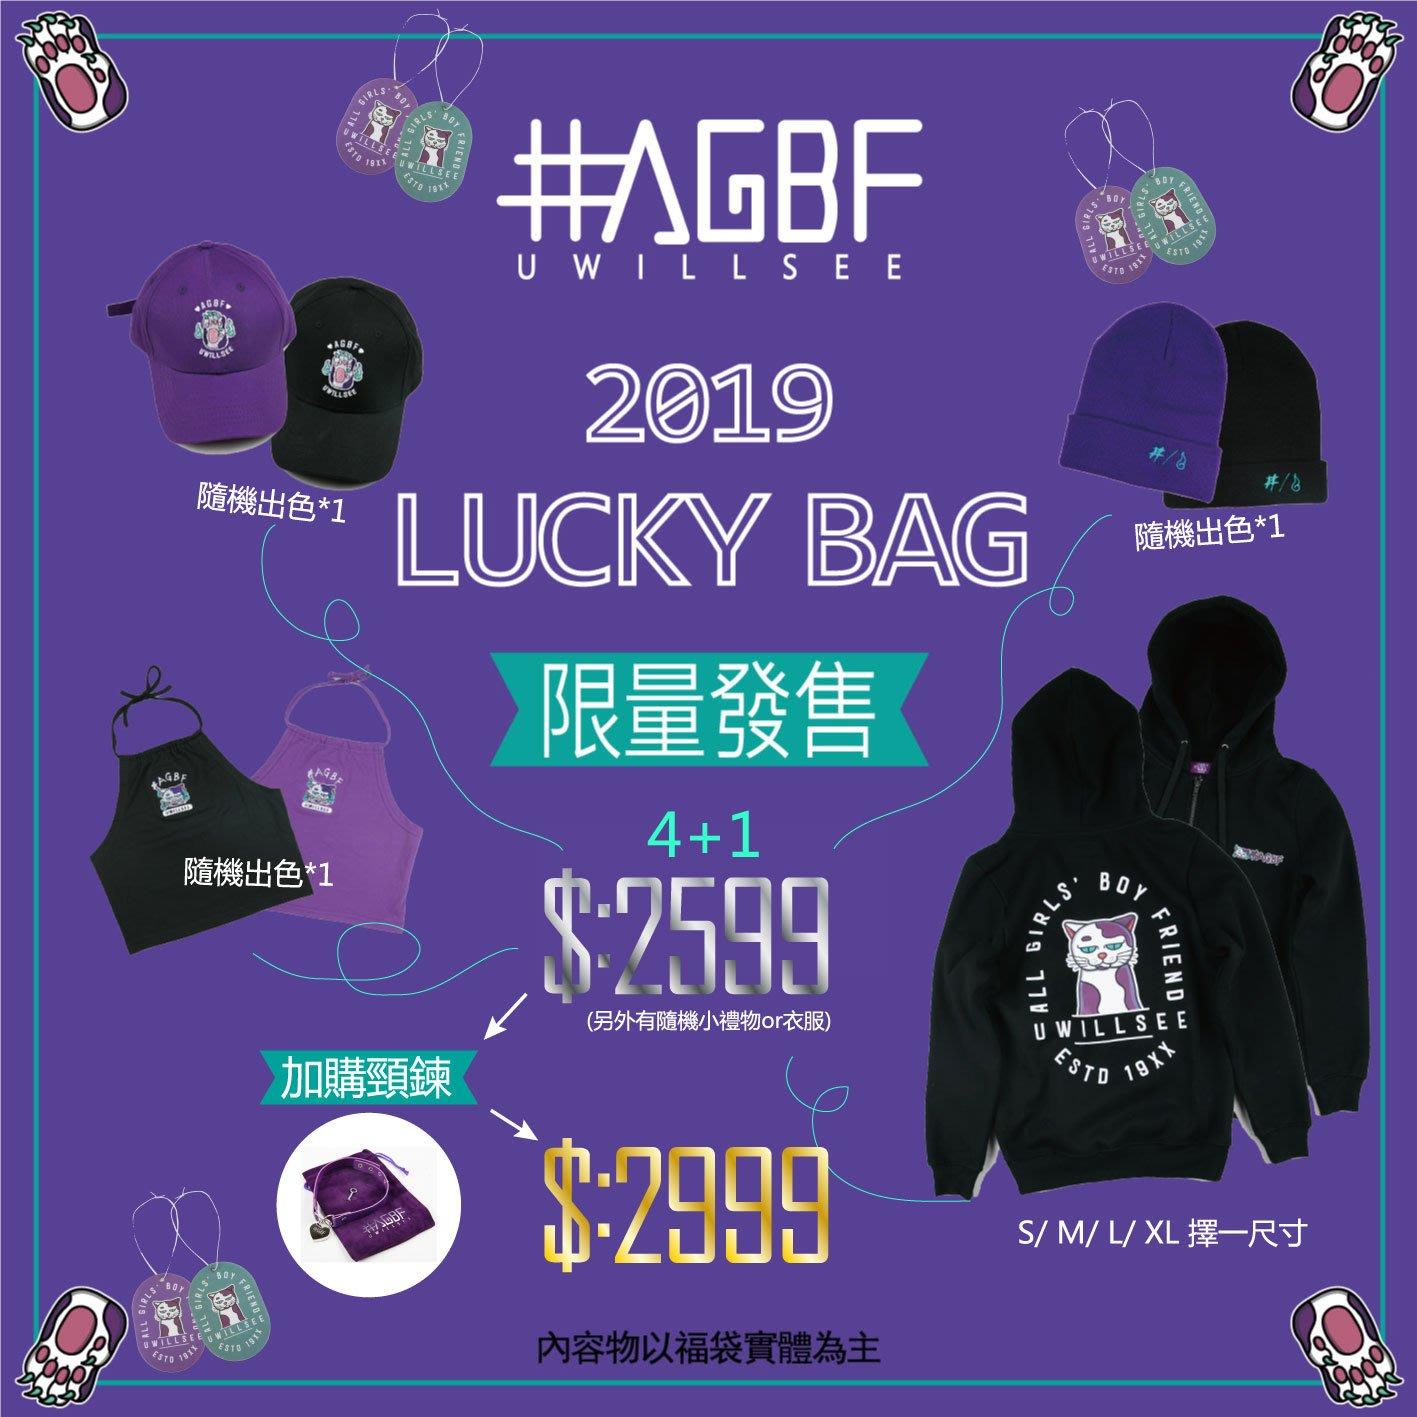 【#AGBF】限定福箱(依照上衣尺碼 S/ M/ L/ XL/) 加購頸鍊 下單區